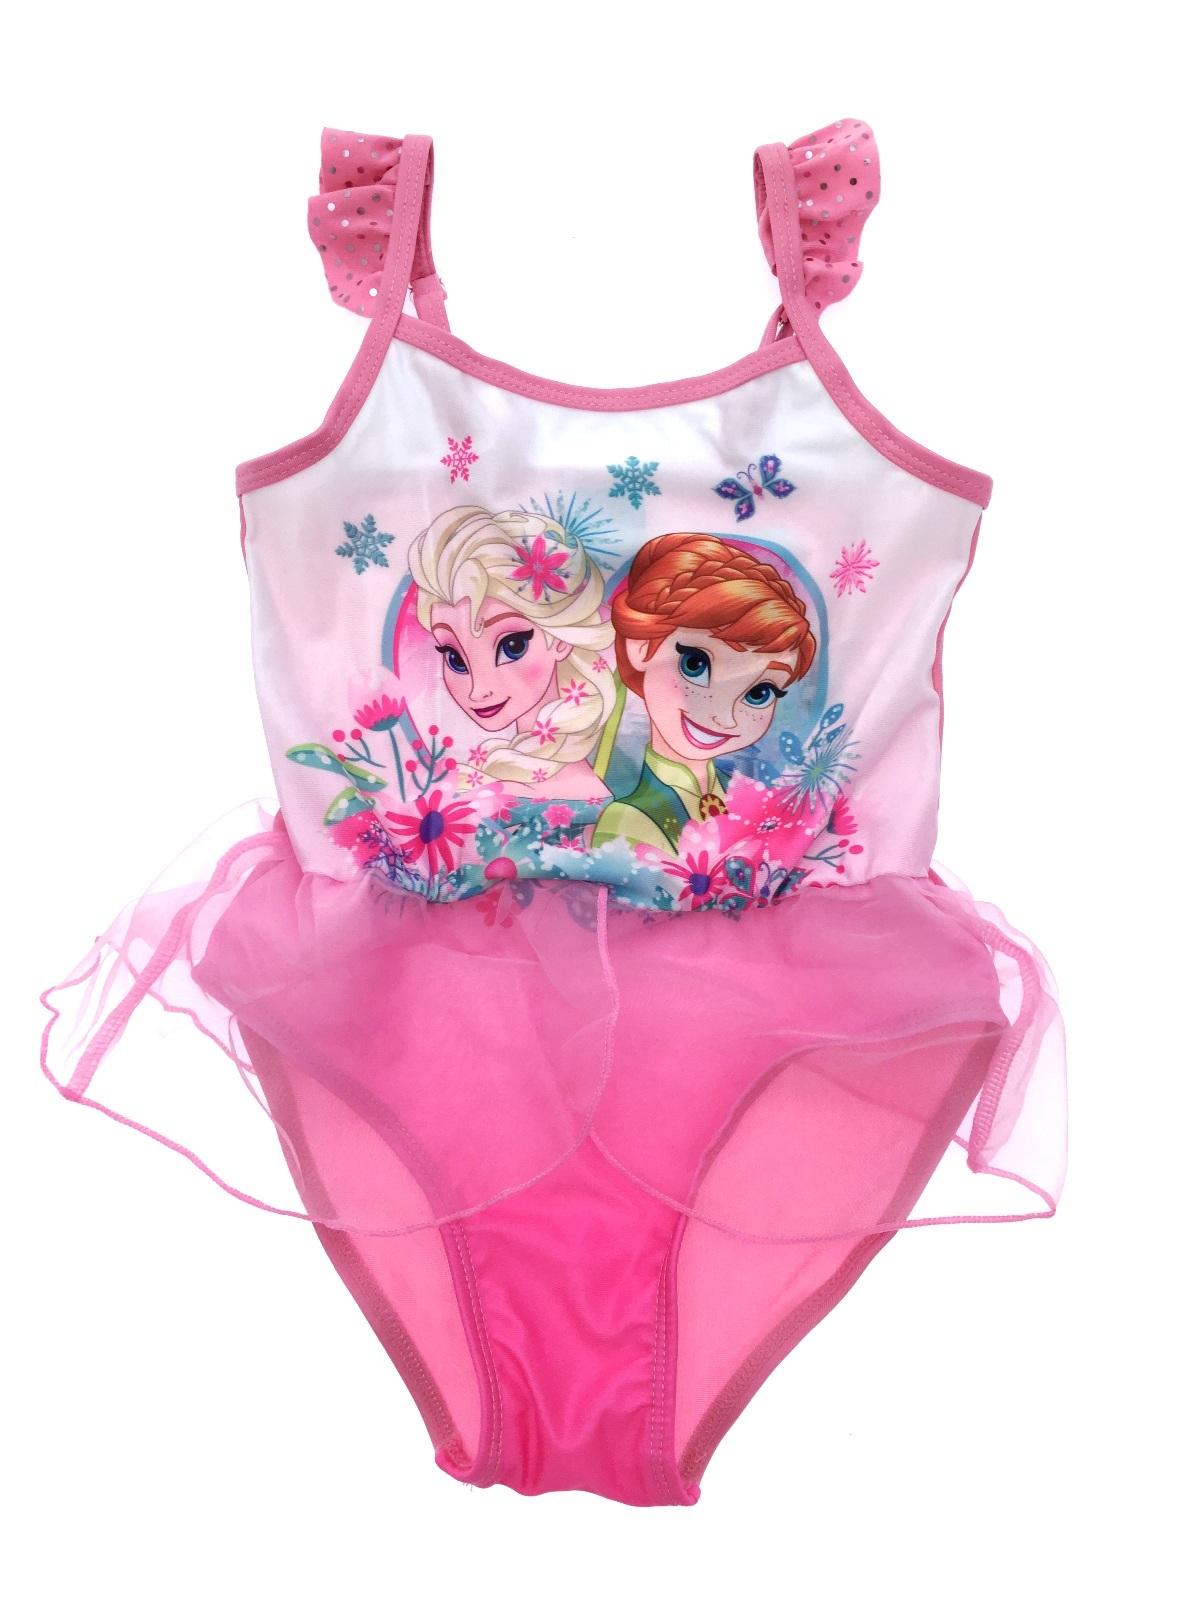 Girls Disney Frozen Elsa Anna Swimming Costume With Skirt